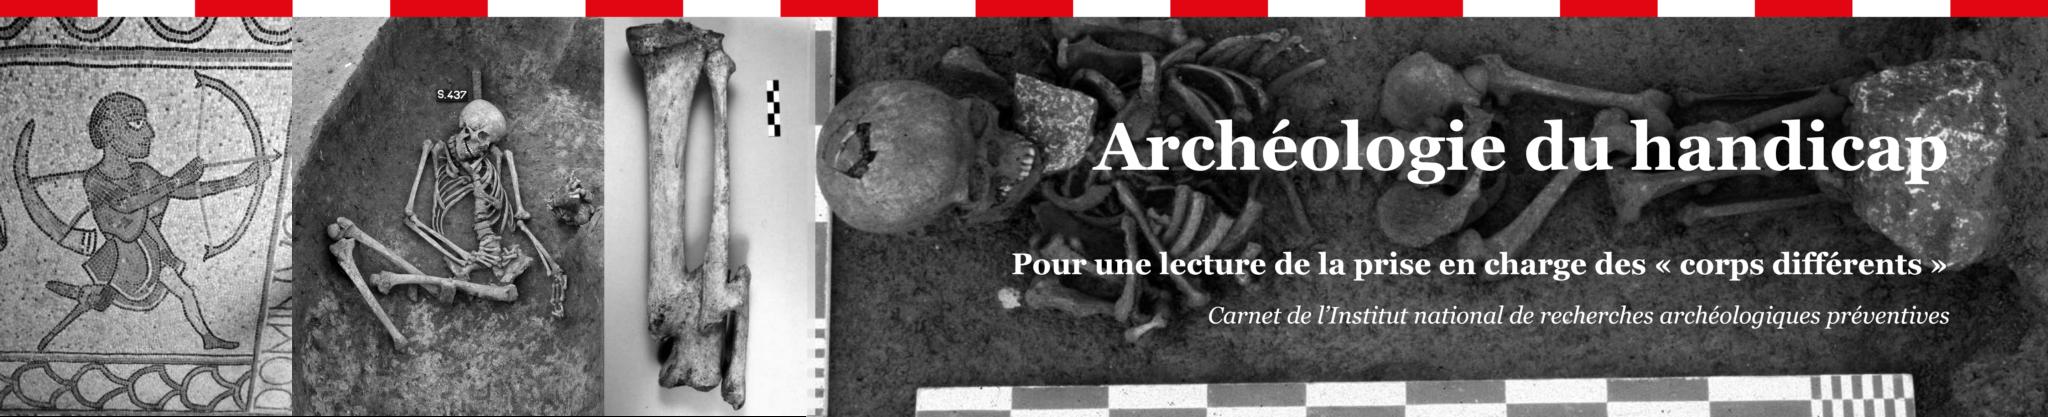 carnet_archeo-handicap-2048x417.png